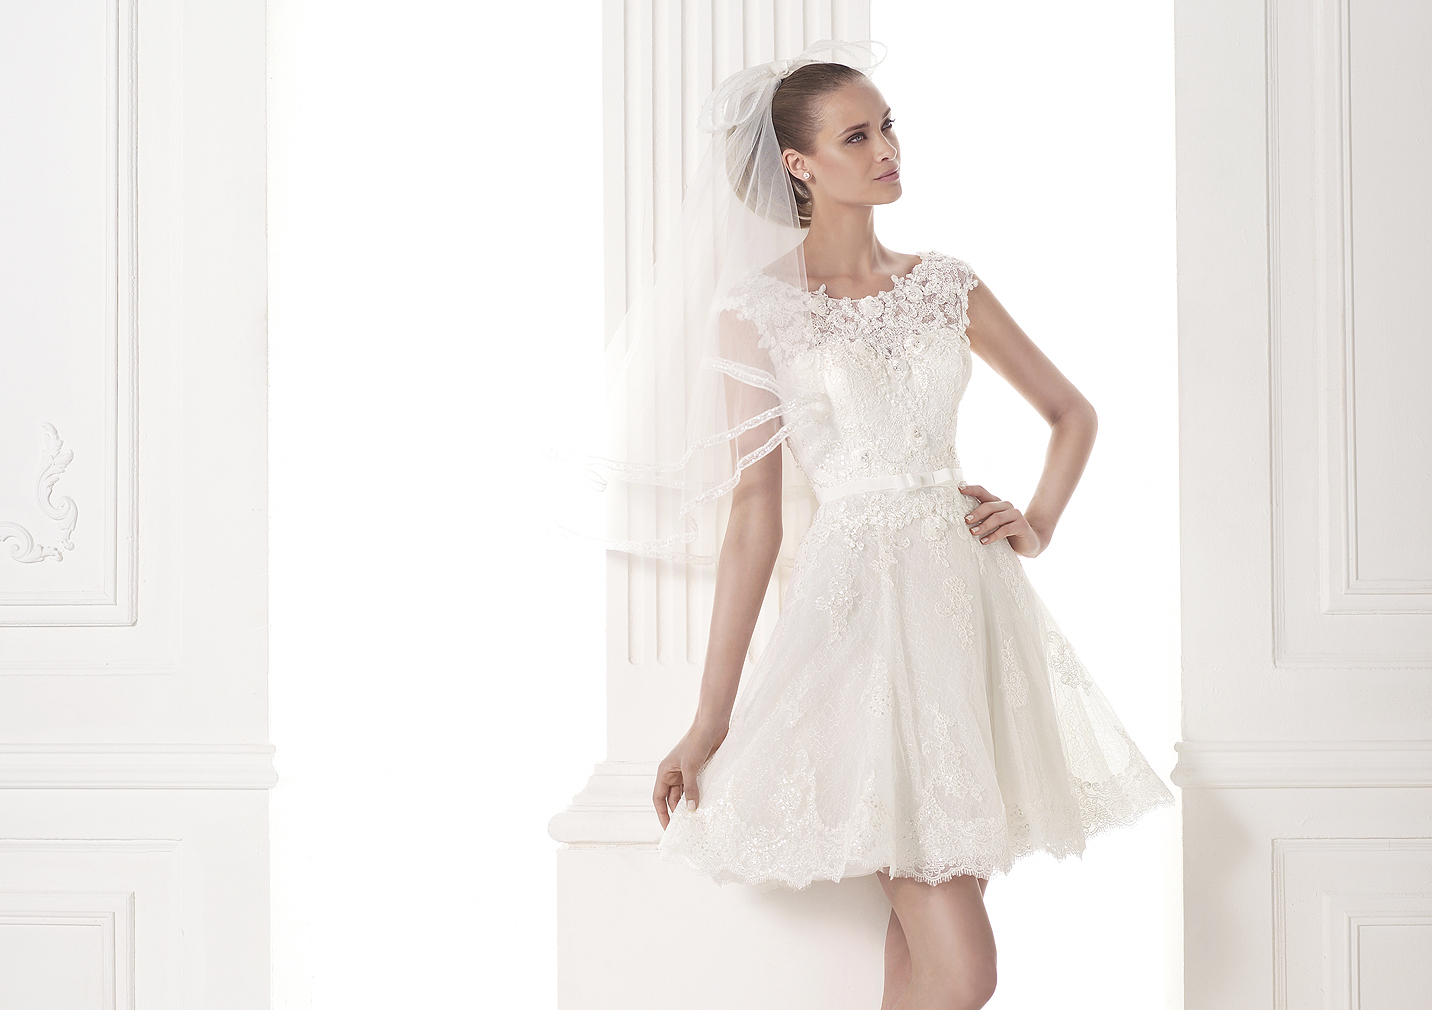 Wedding dresses usa stores vosoi 10 reasons to love short wedding dresses ombrellifo Gallery